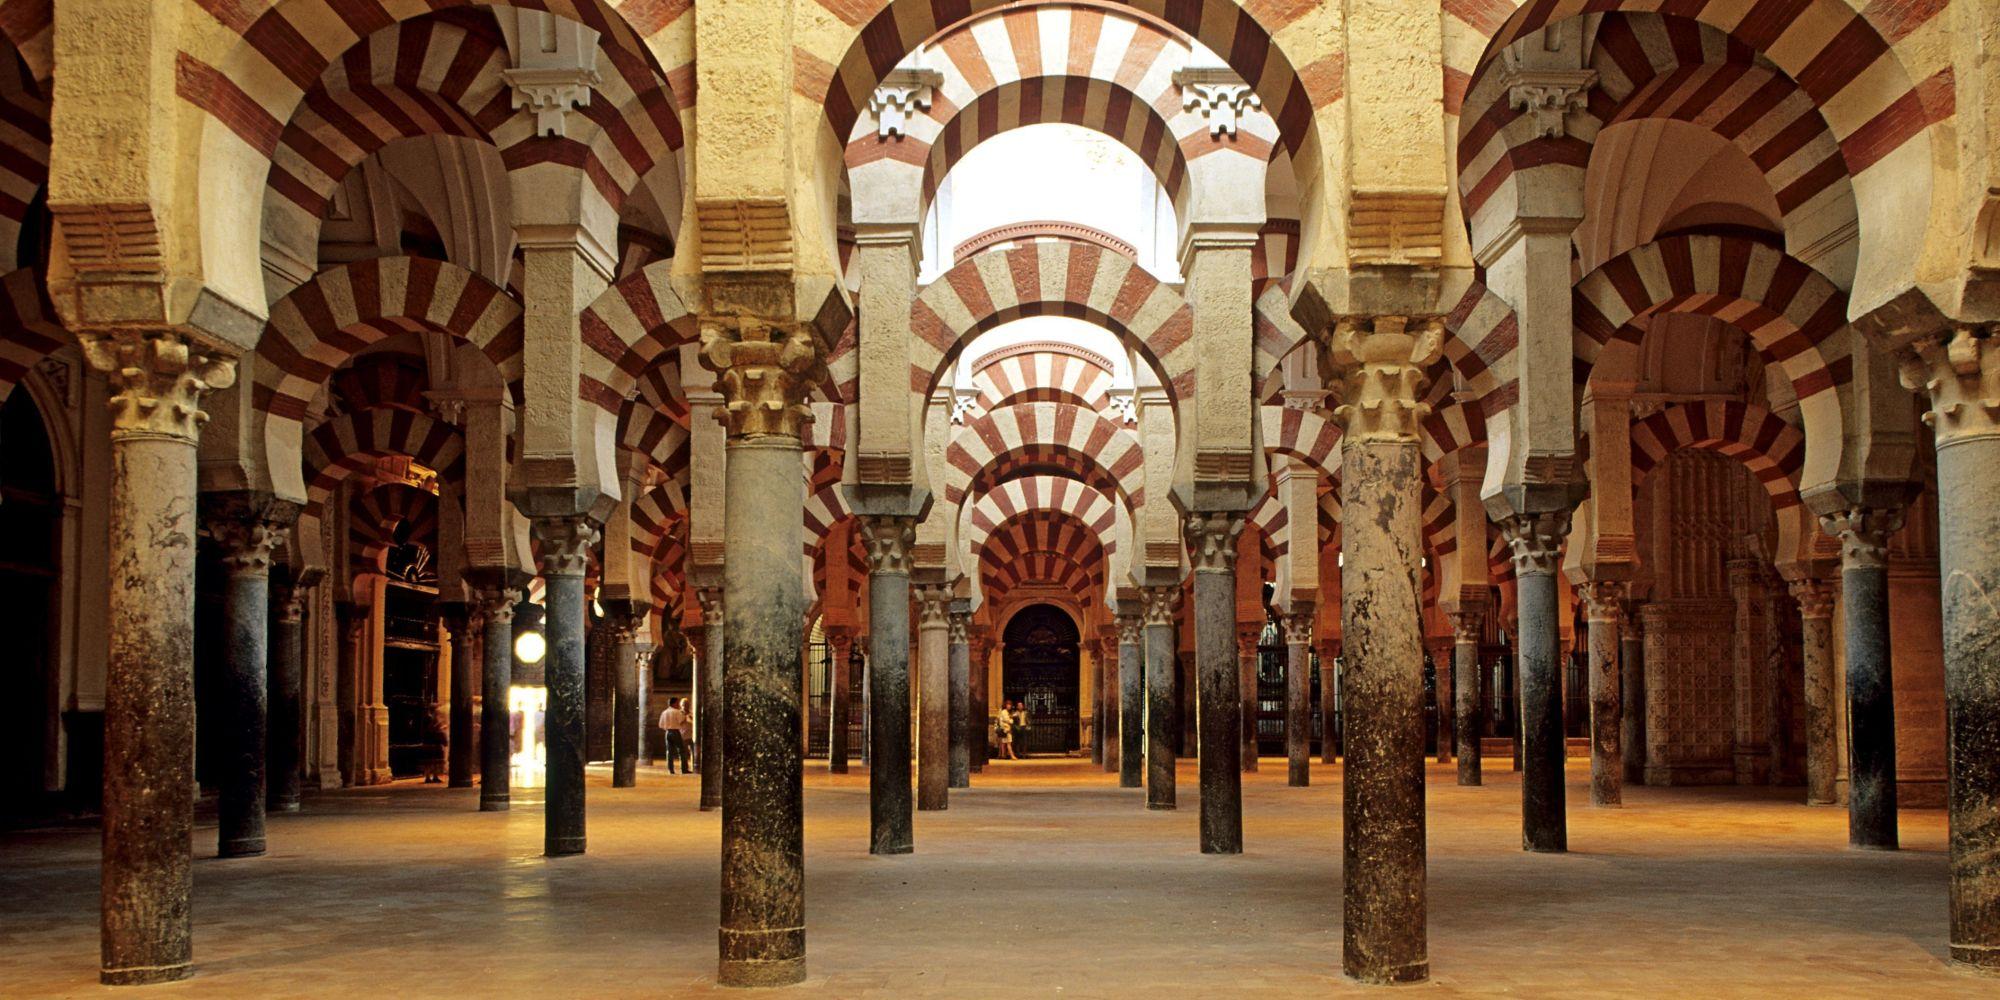 Que Es Una Mezquita Pinterest: Tutto CÓRDOBA